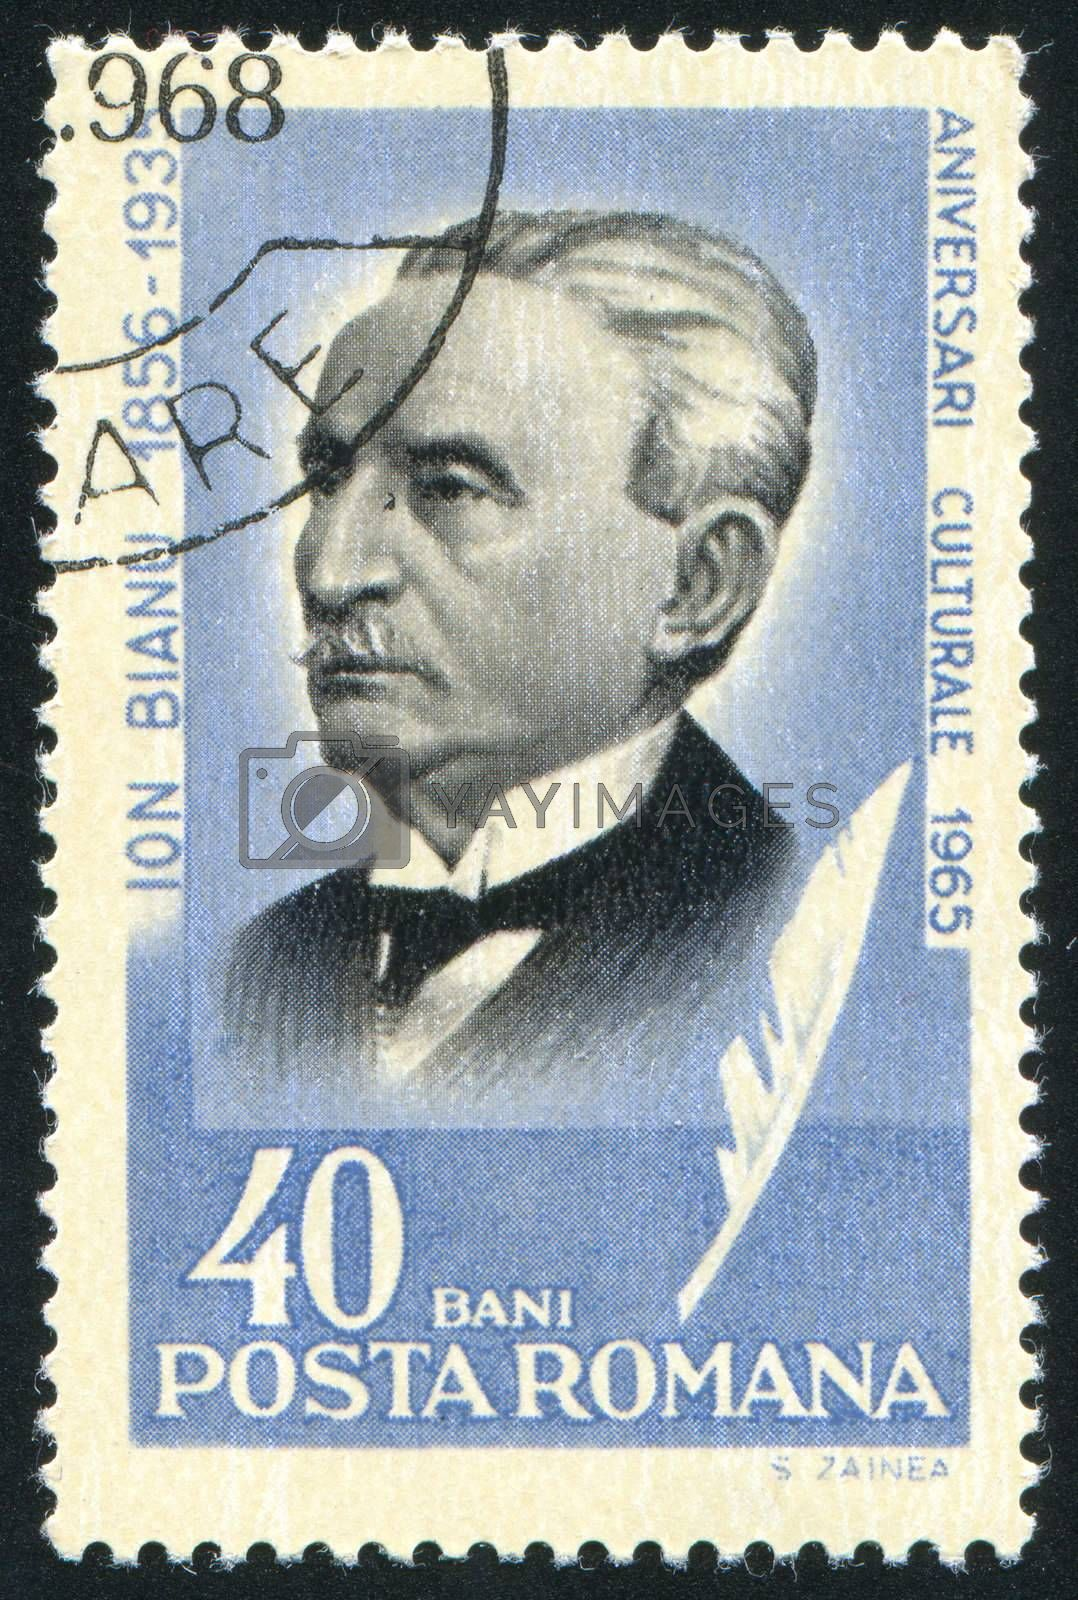 ROMANIA - CIRCA 1965: stamp printed by Romania, show Ion Bianu, philologist and historian, circa 1965.